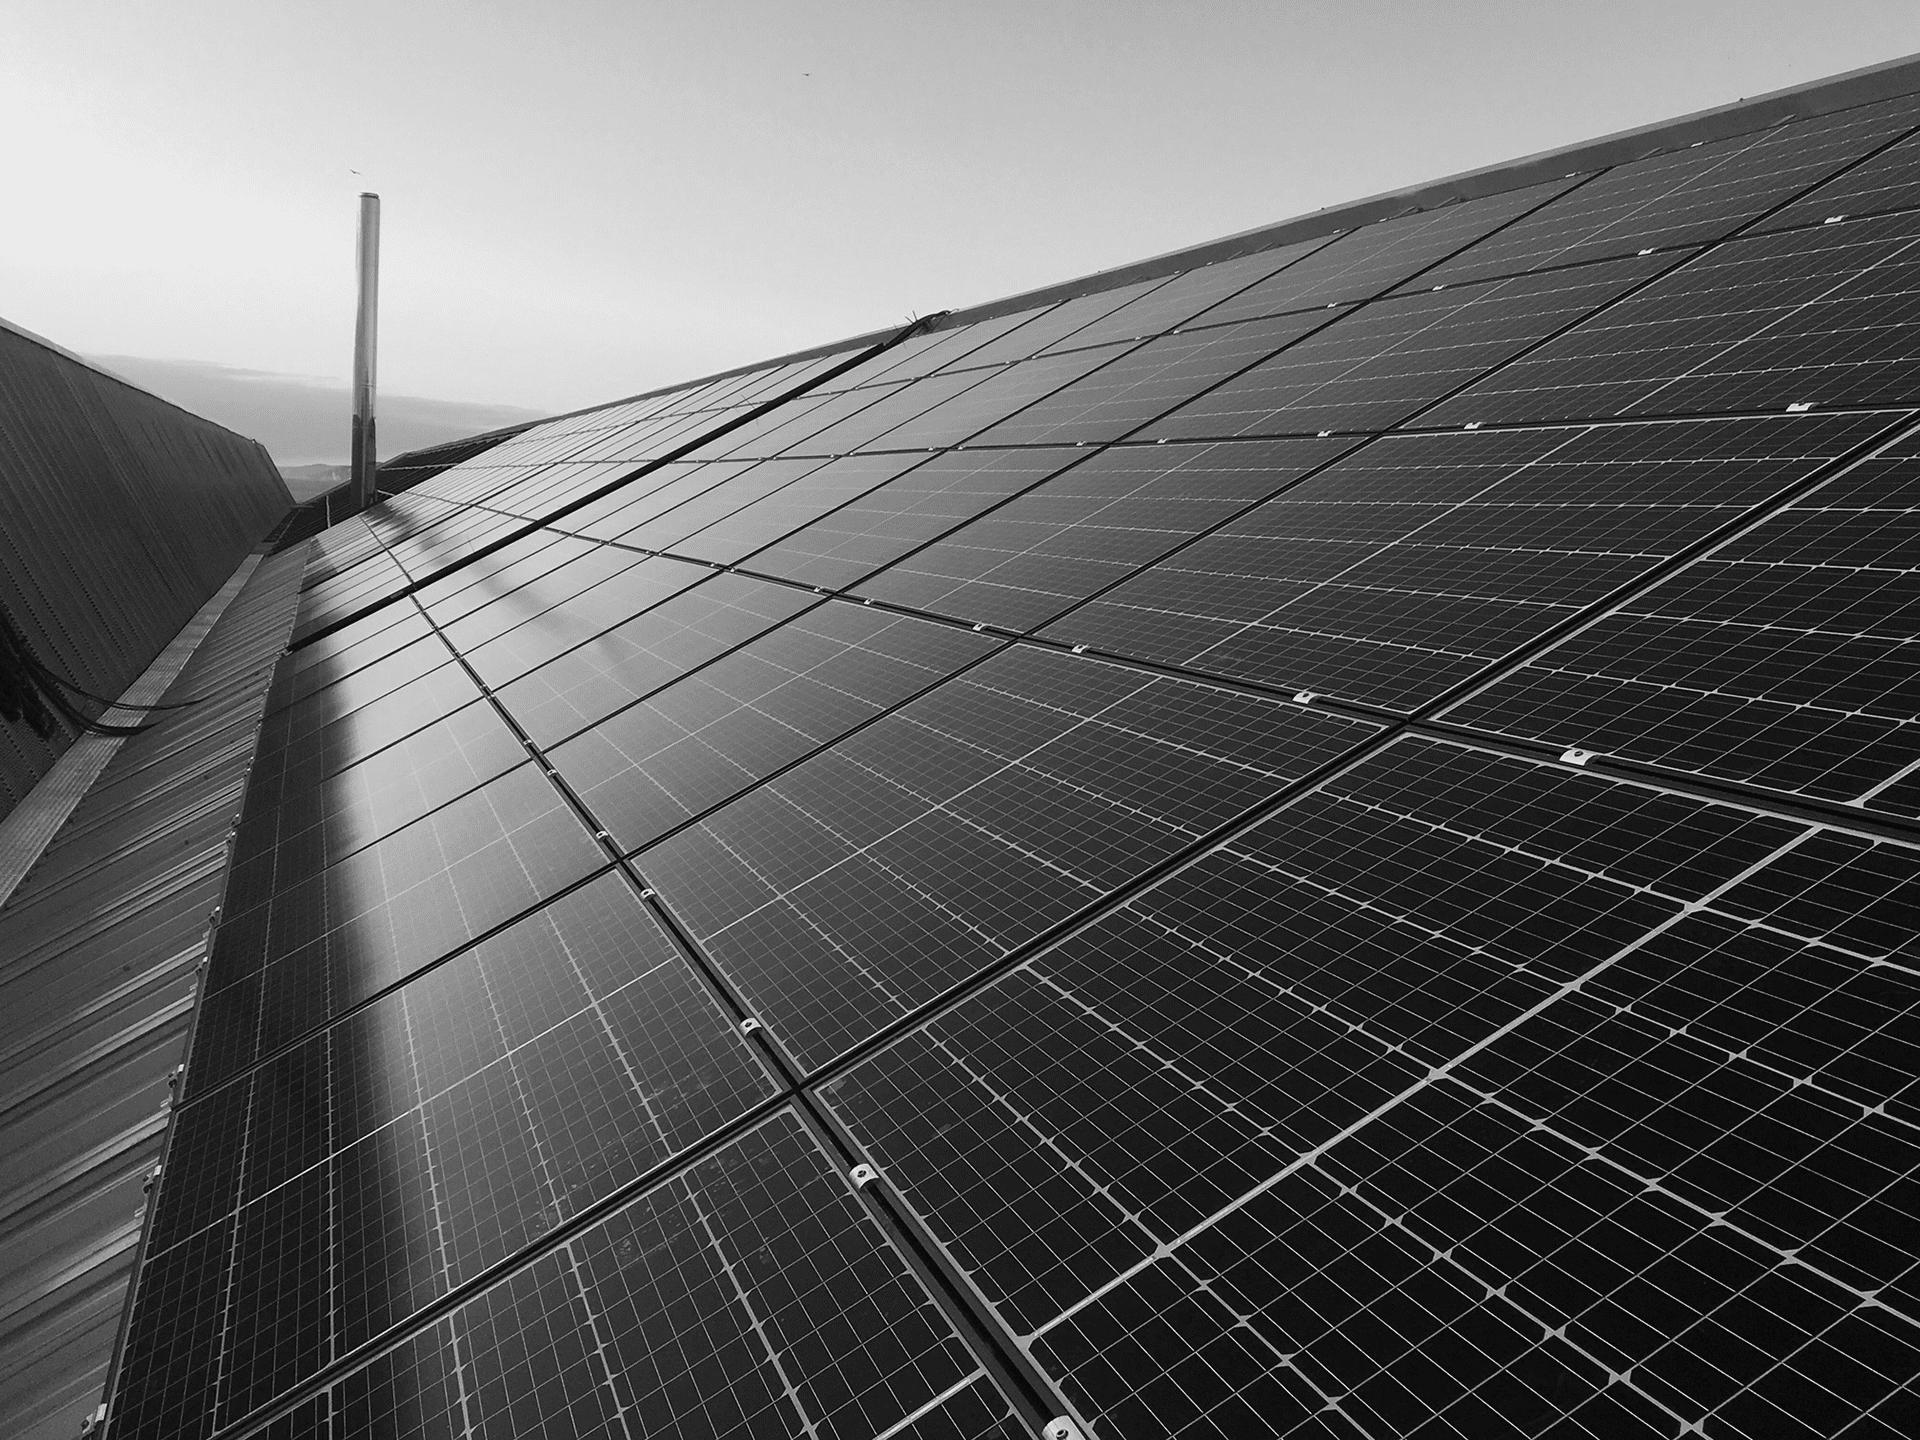 Trapezoidal-sheet-roofing-solar-panels